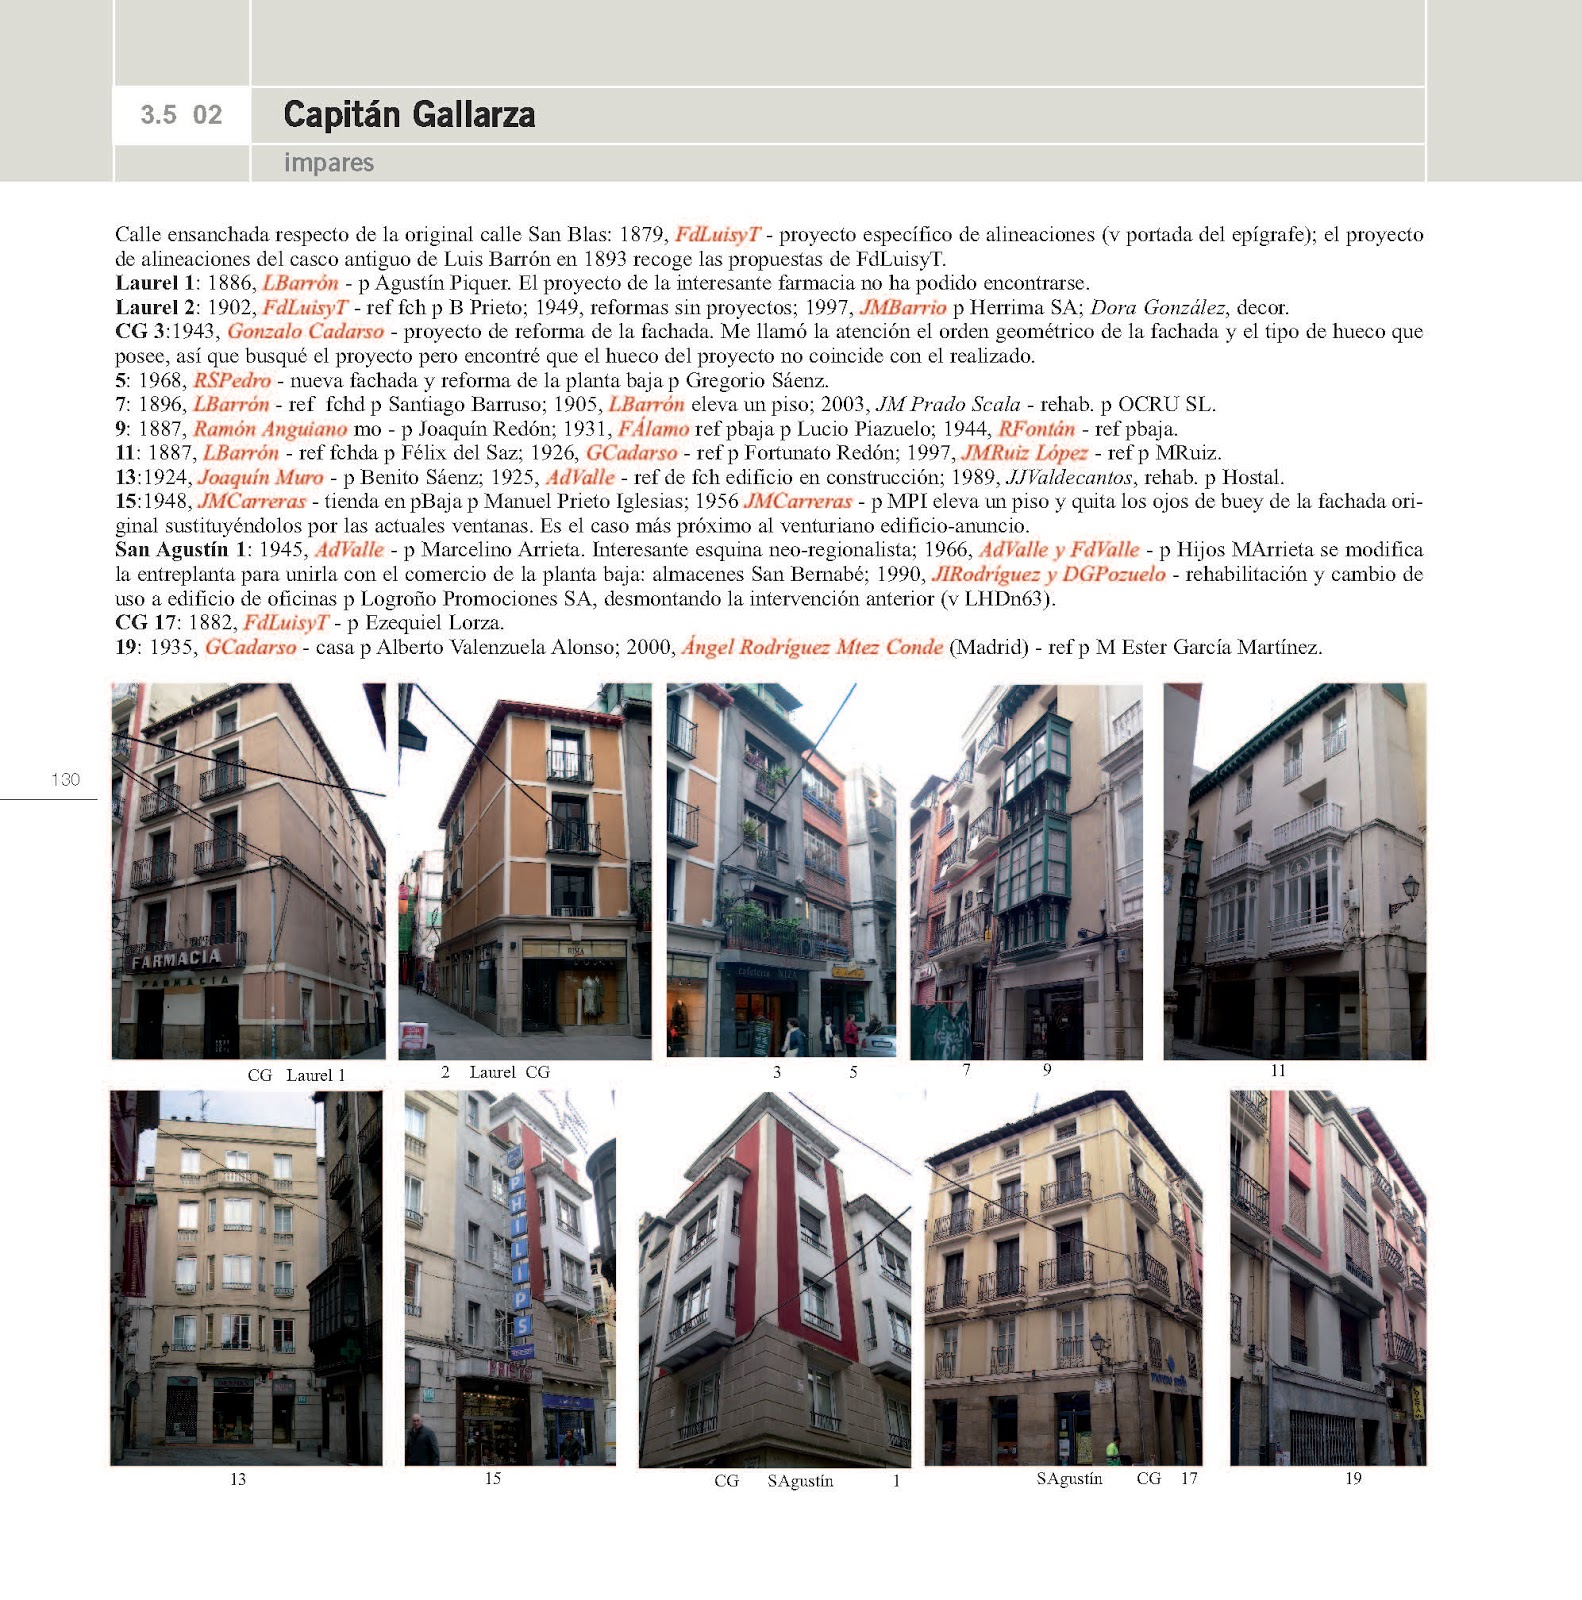 Guia De Arquitectura De Logro O Paginas 3 5 02 Capitan